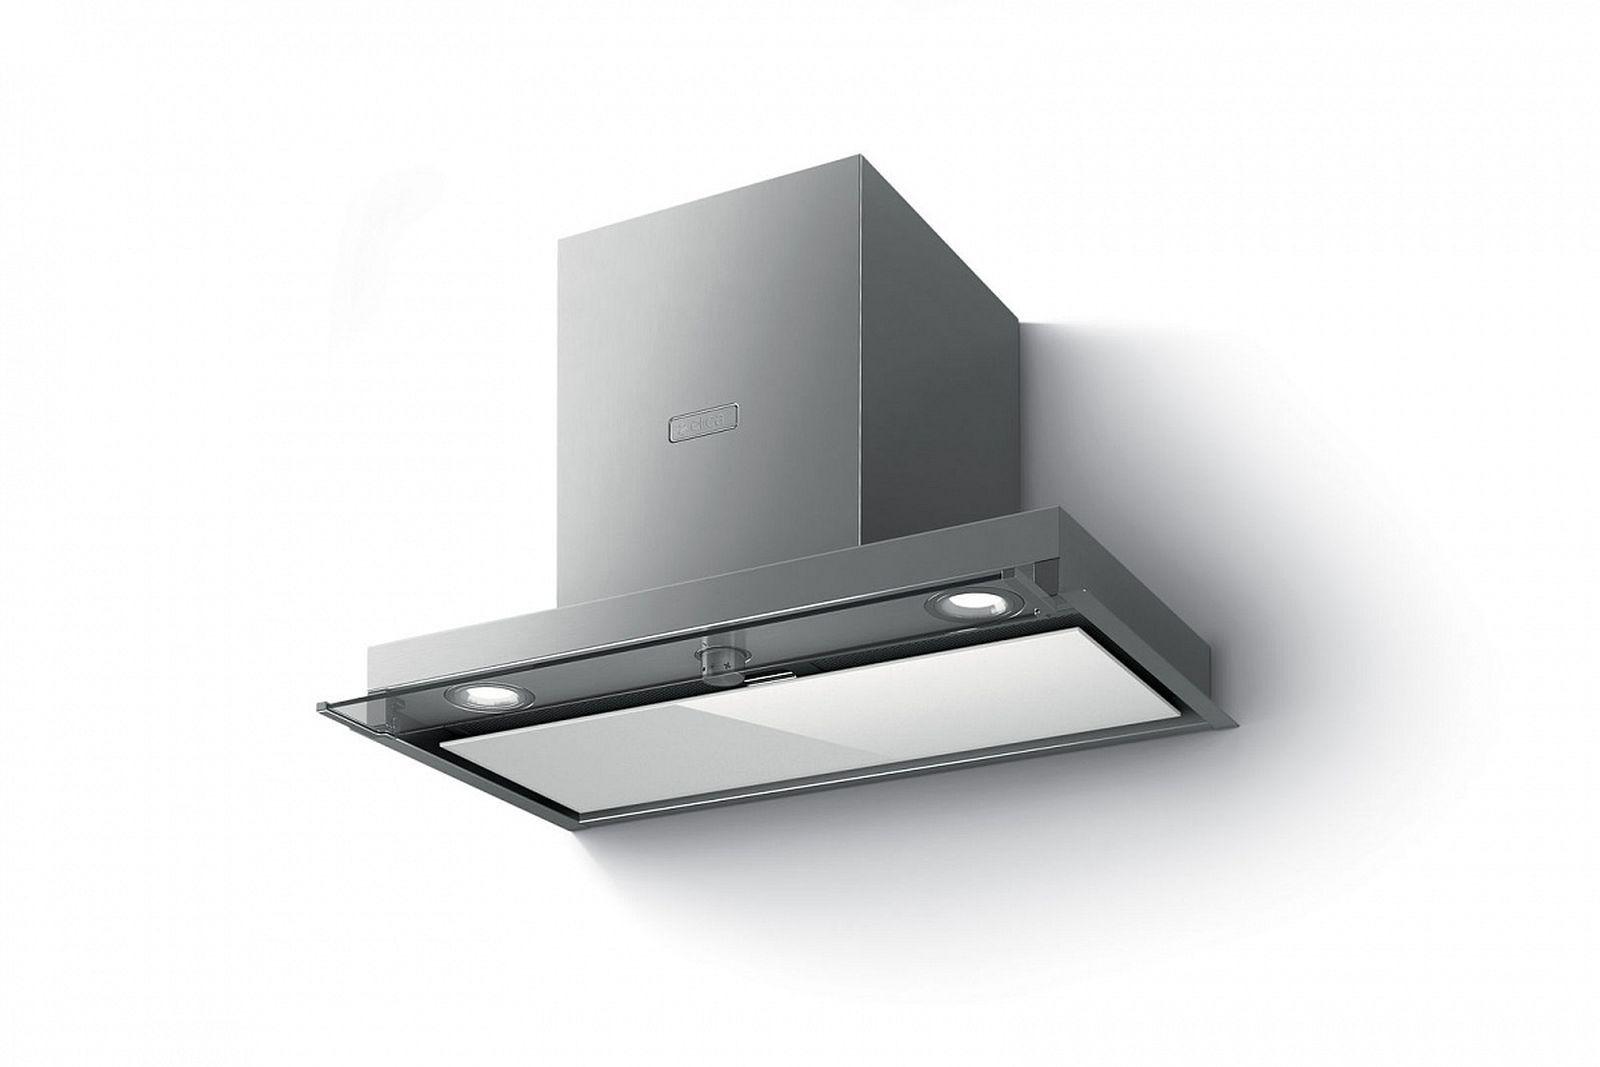 Вытяжка ELICA BOX IN PLUS IXGL/A/90-PRF0097796